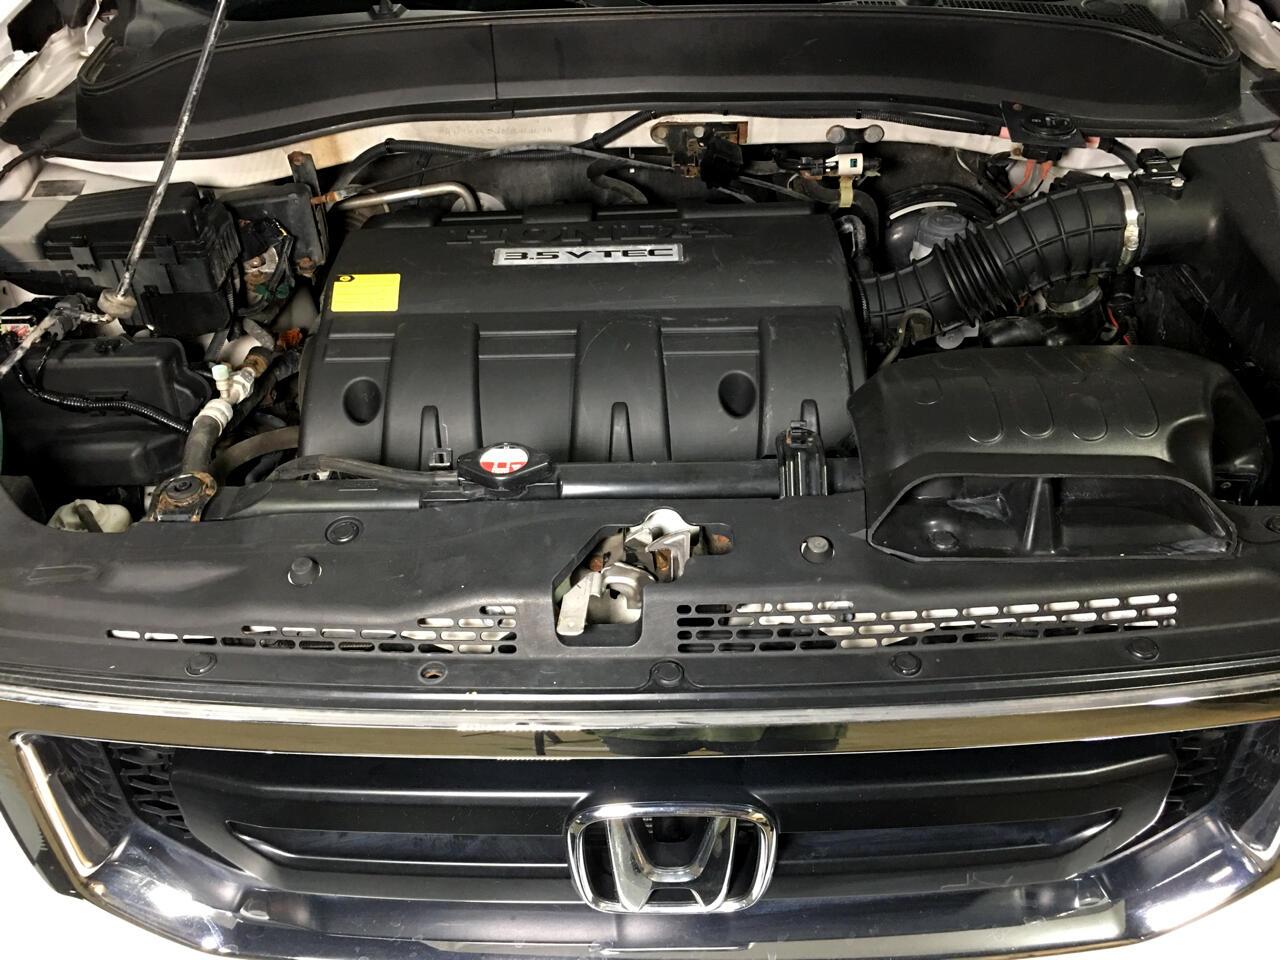 Pre-Owned 2010 Honda Ridgeline 4WD Crew Cab RT